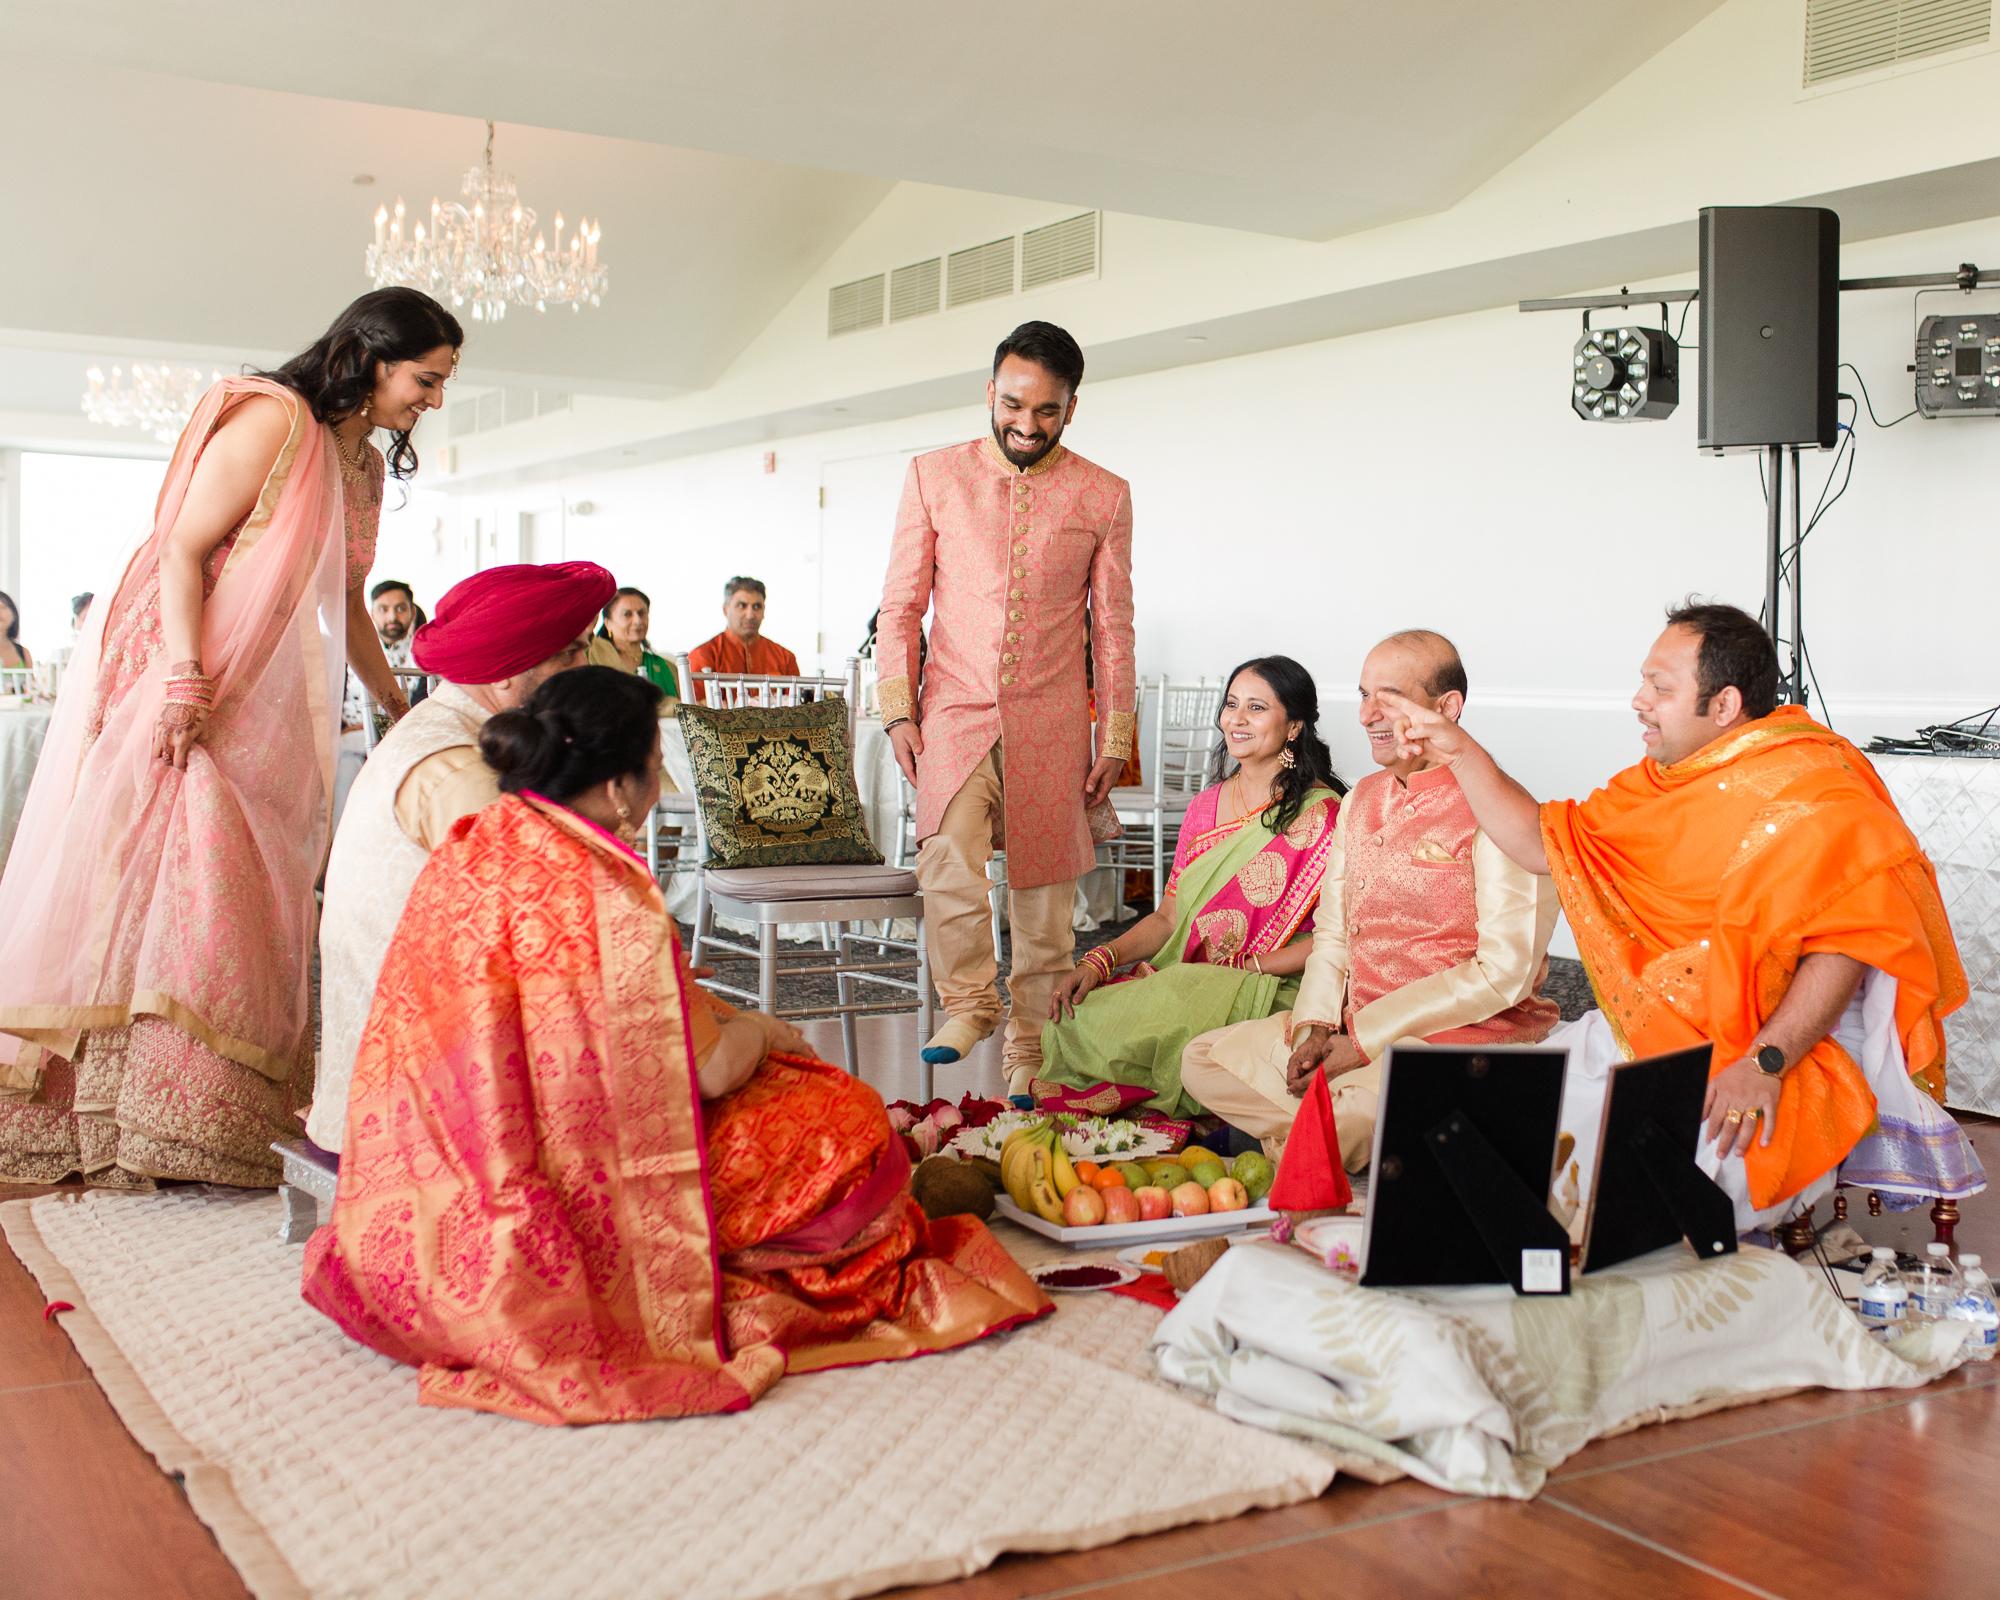 anumeet and gopika, indian engagement ring ceremony, top of the town, alexandria, northern virginia, nova weddings-23.jpg